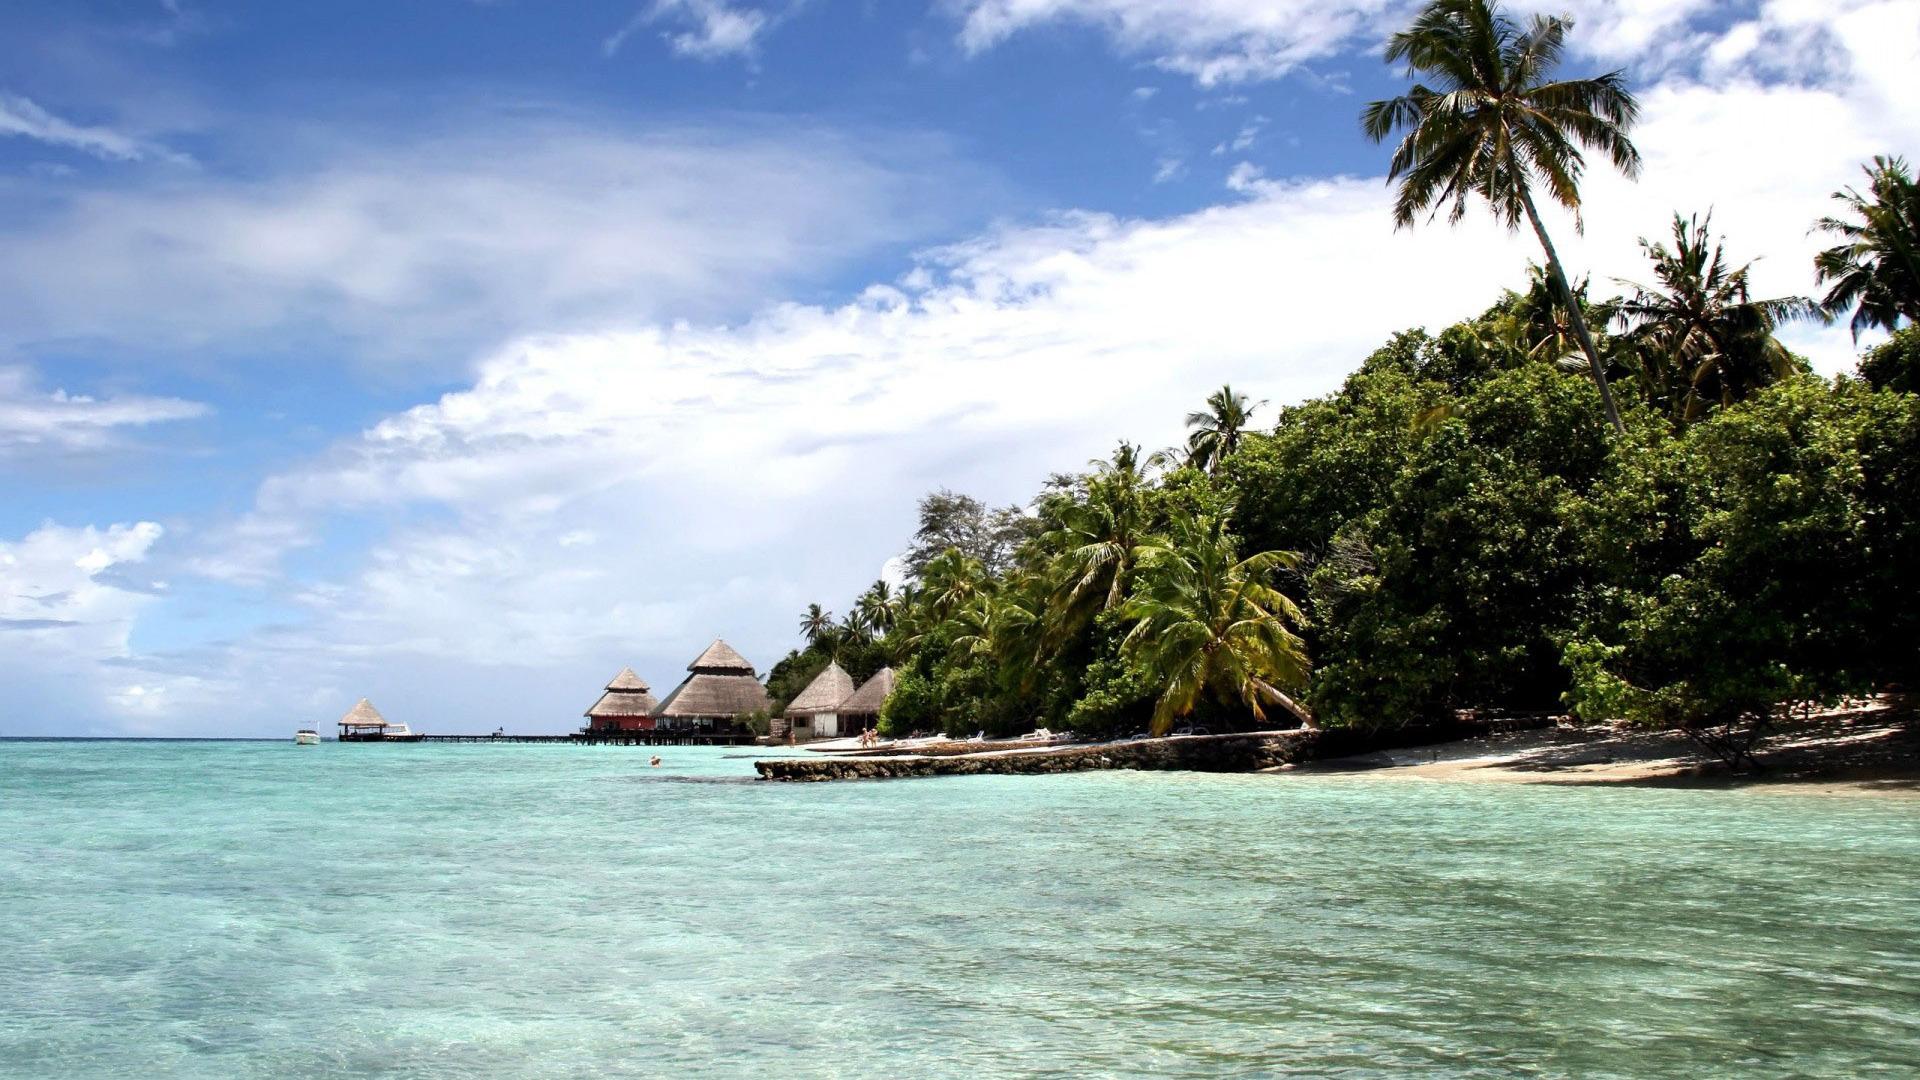 Tropical island wallpaper #10130